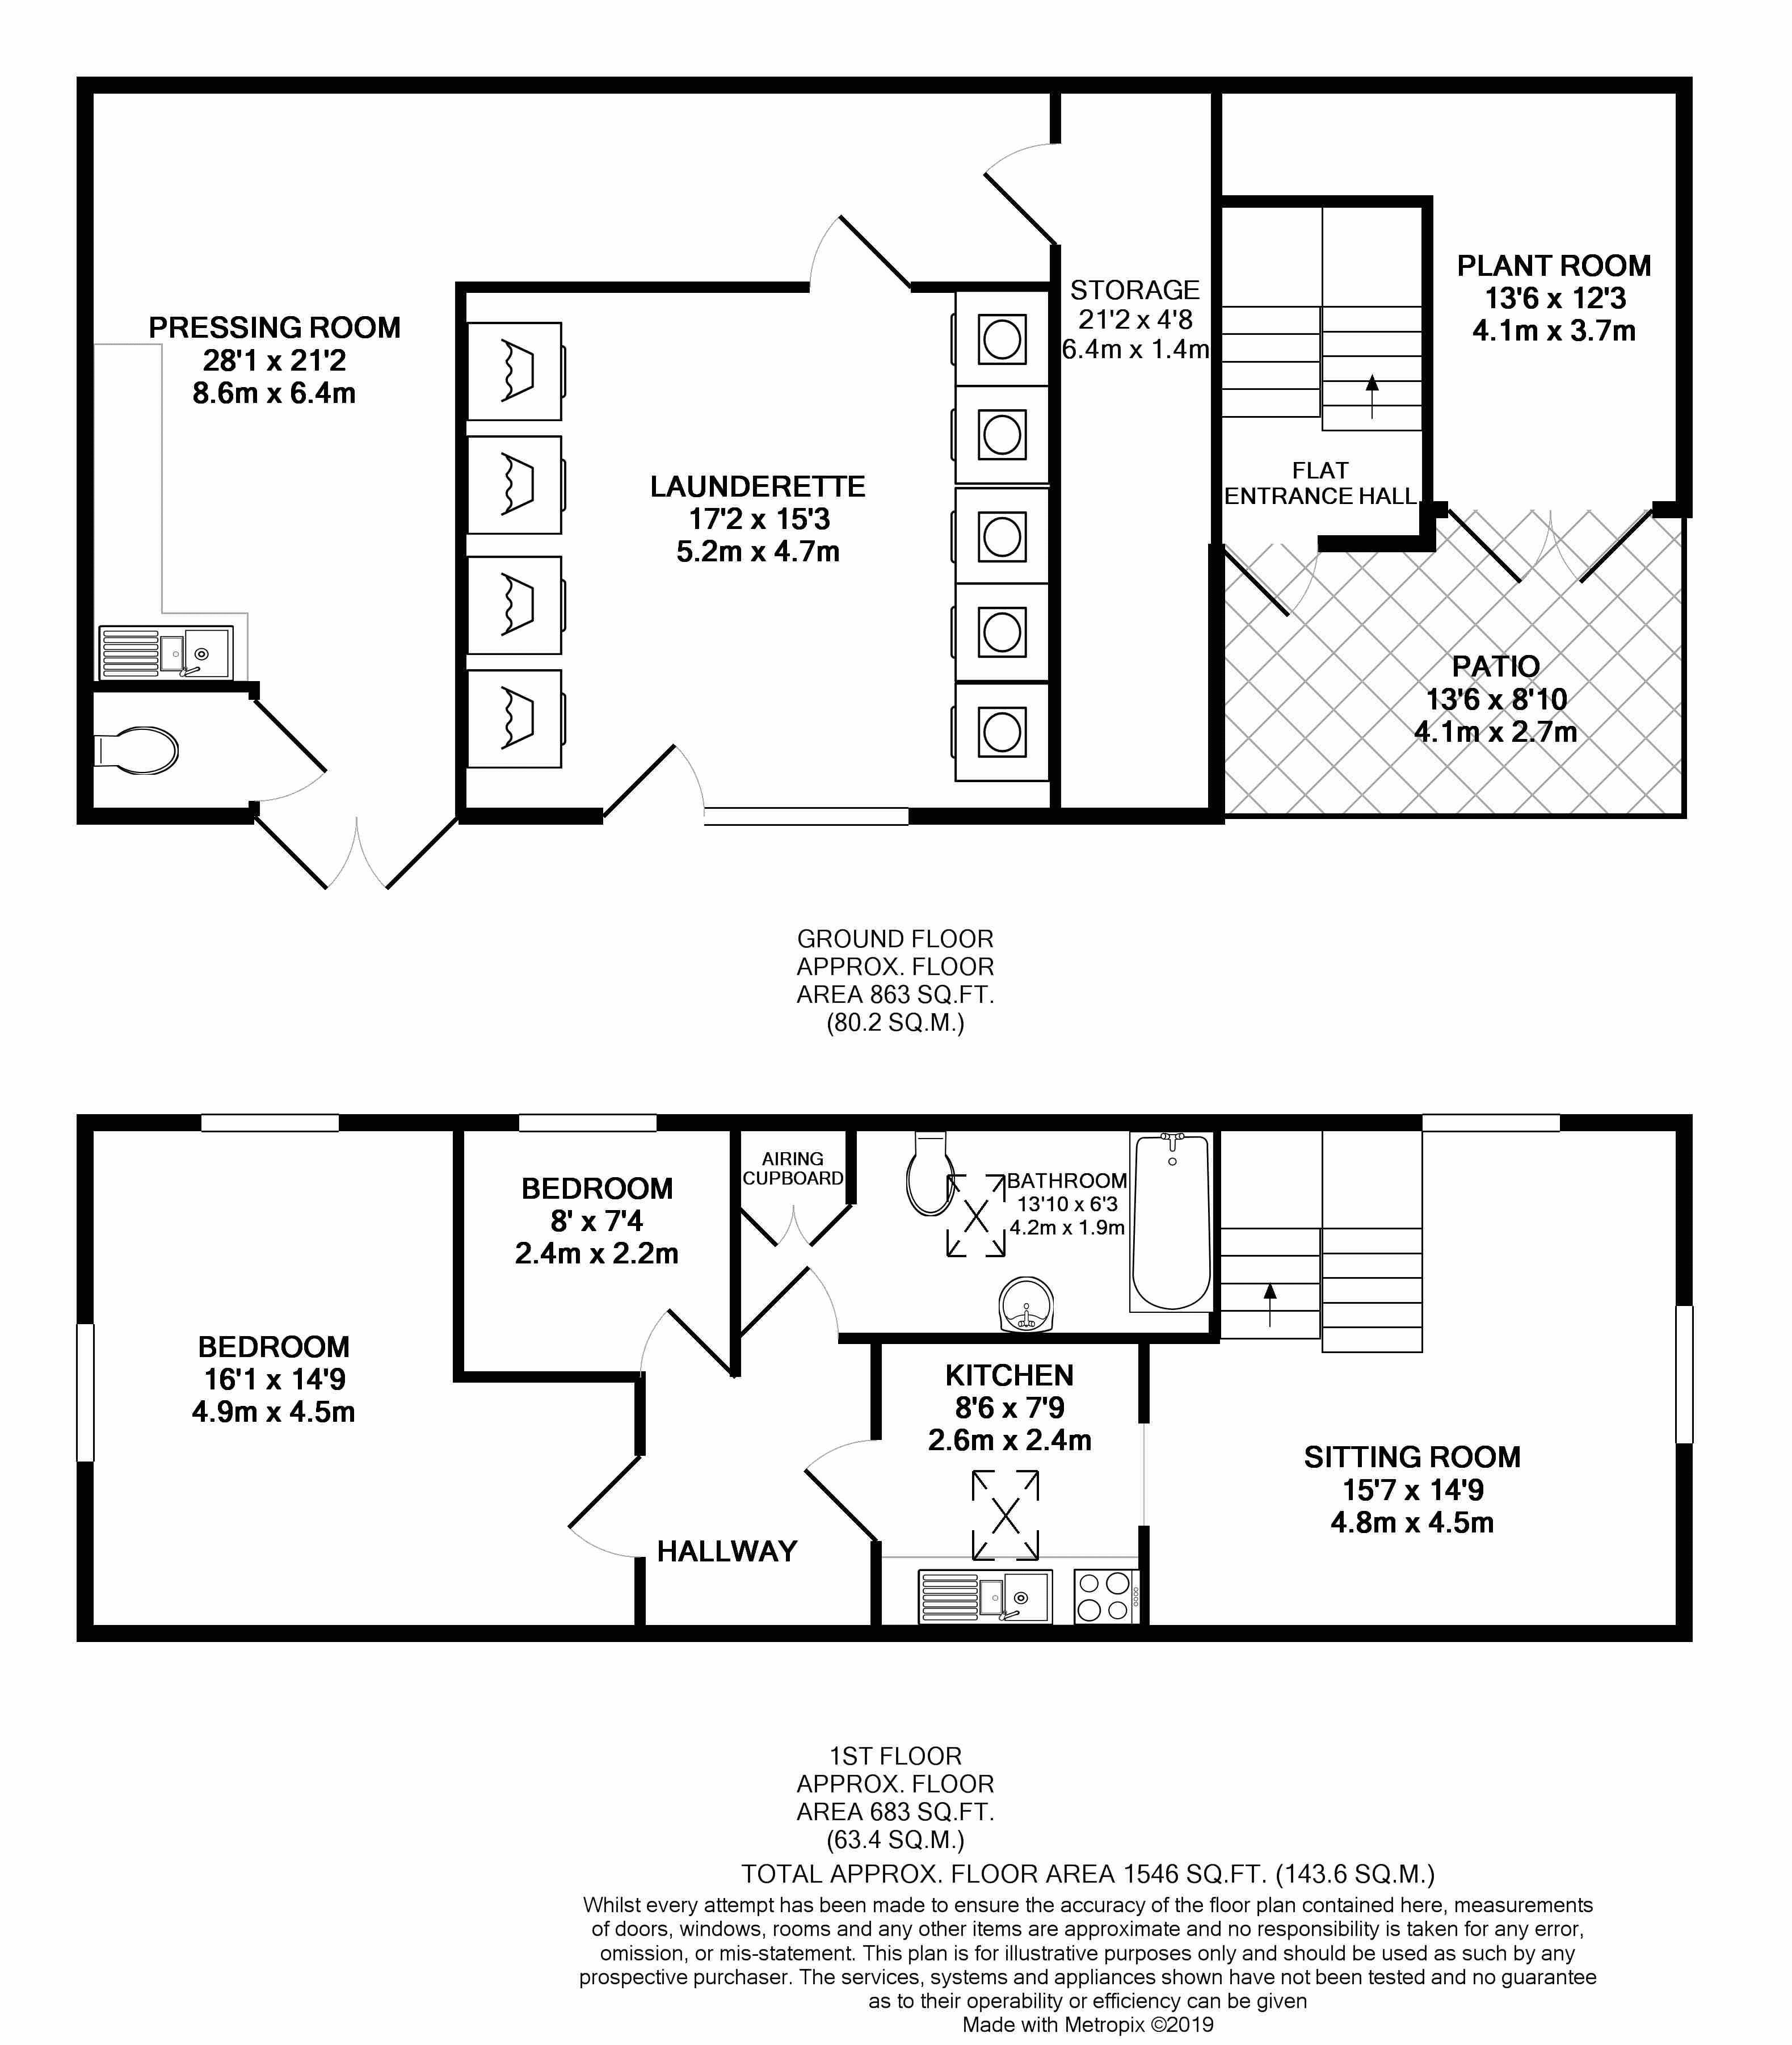 Cavendish Place Floor Plan B&W